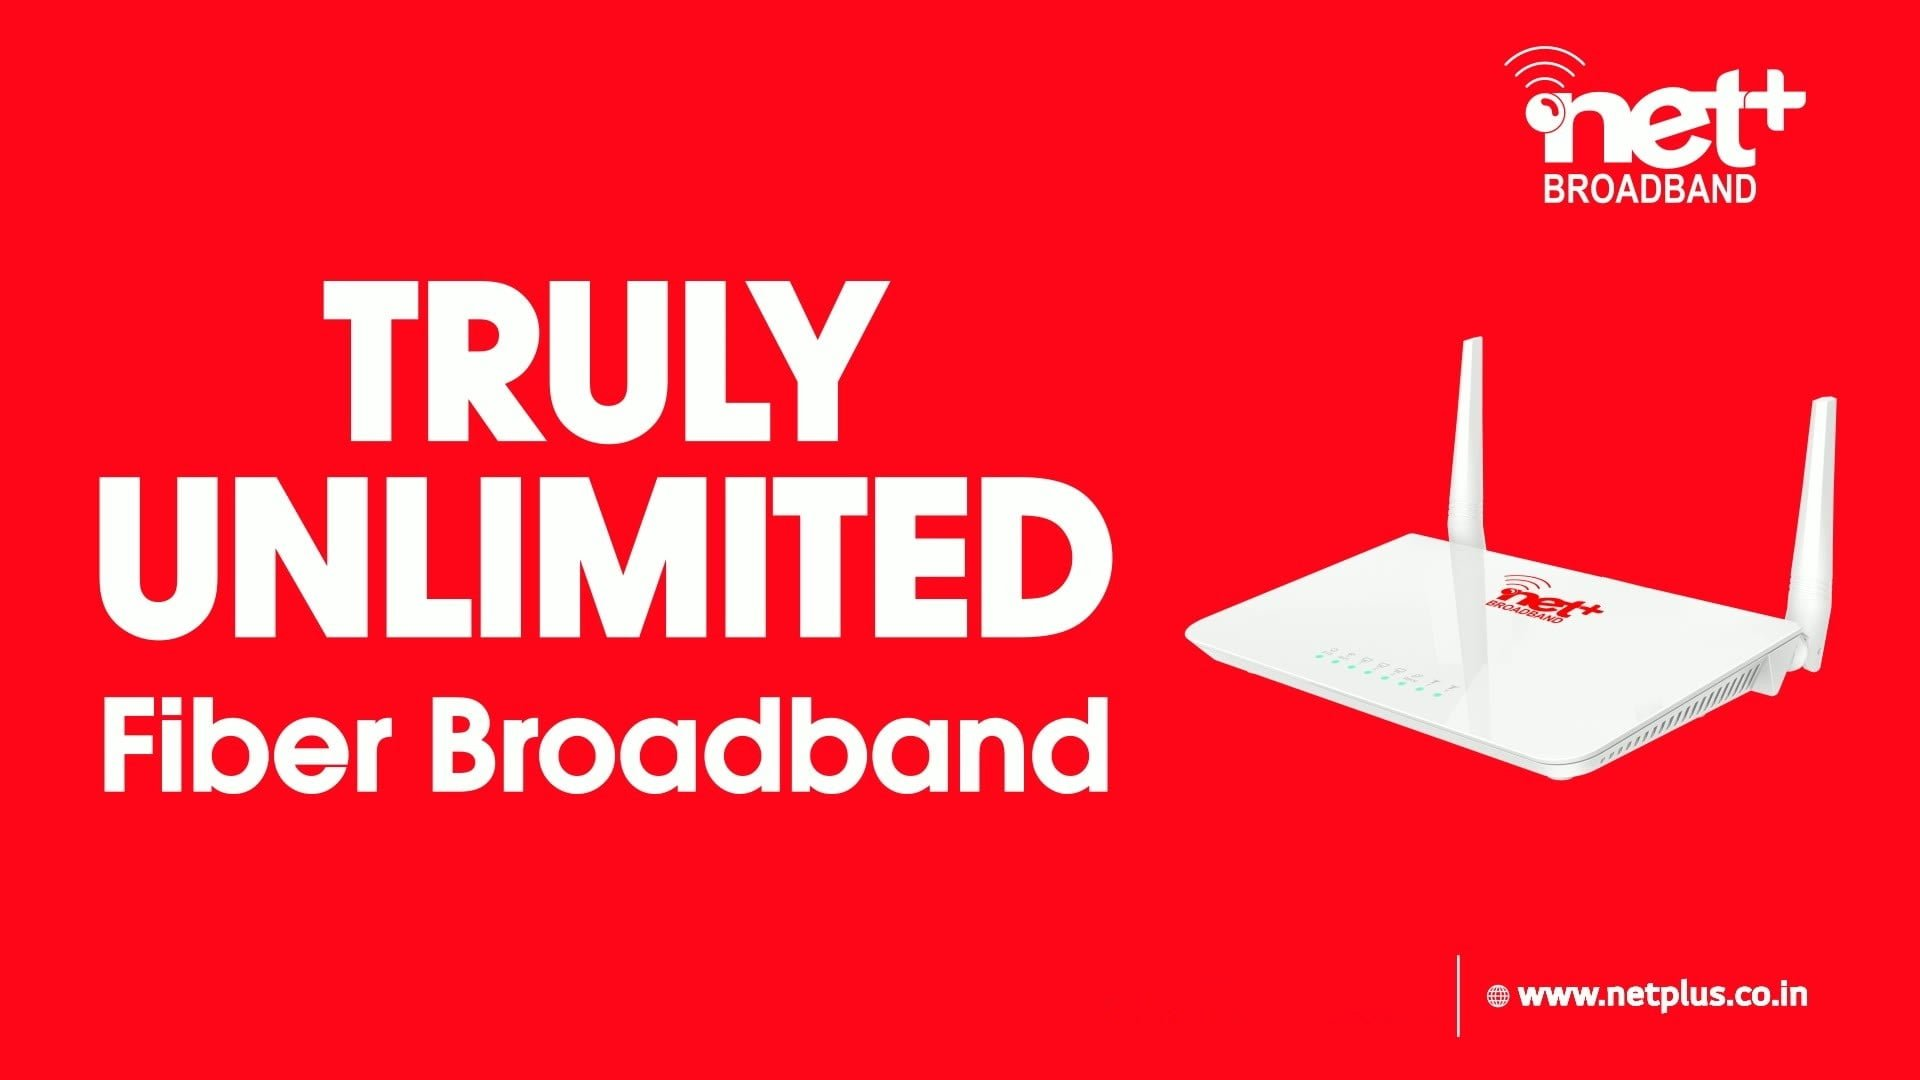 Net Plus Broadband